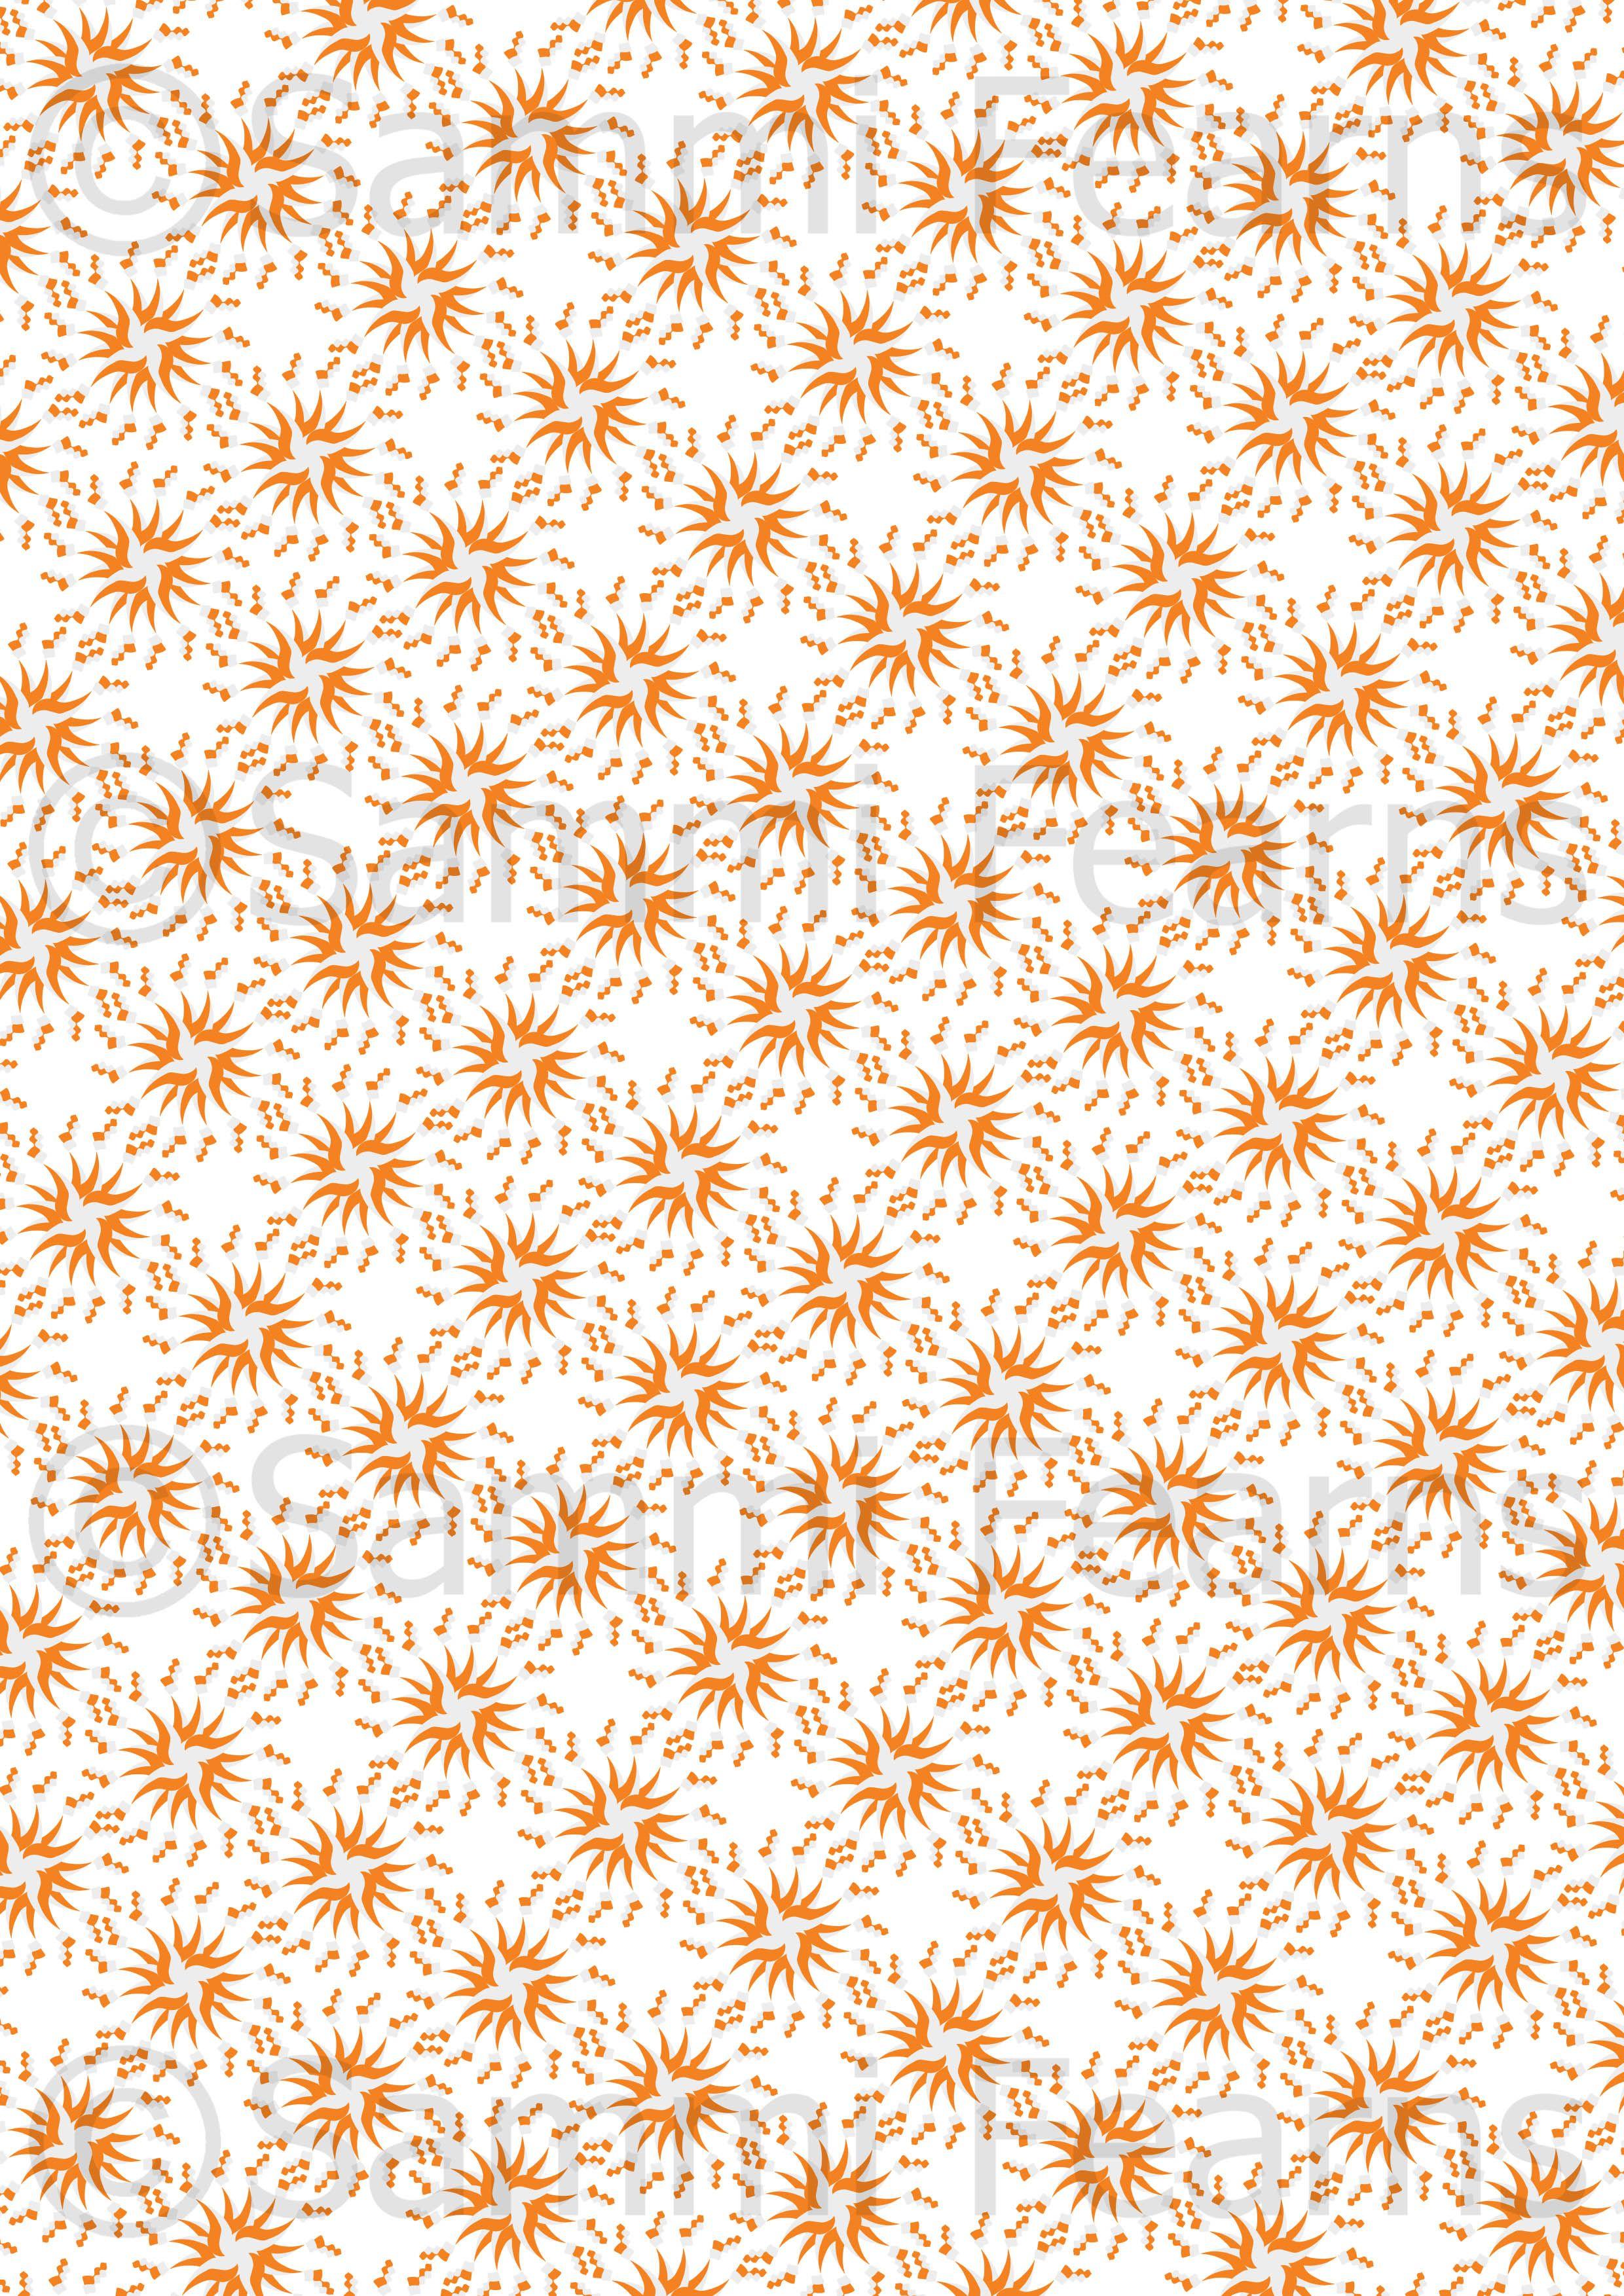 Orange silhouette design